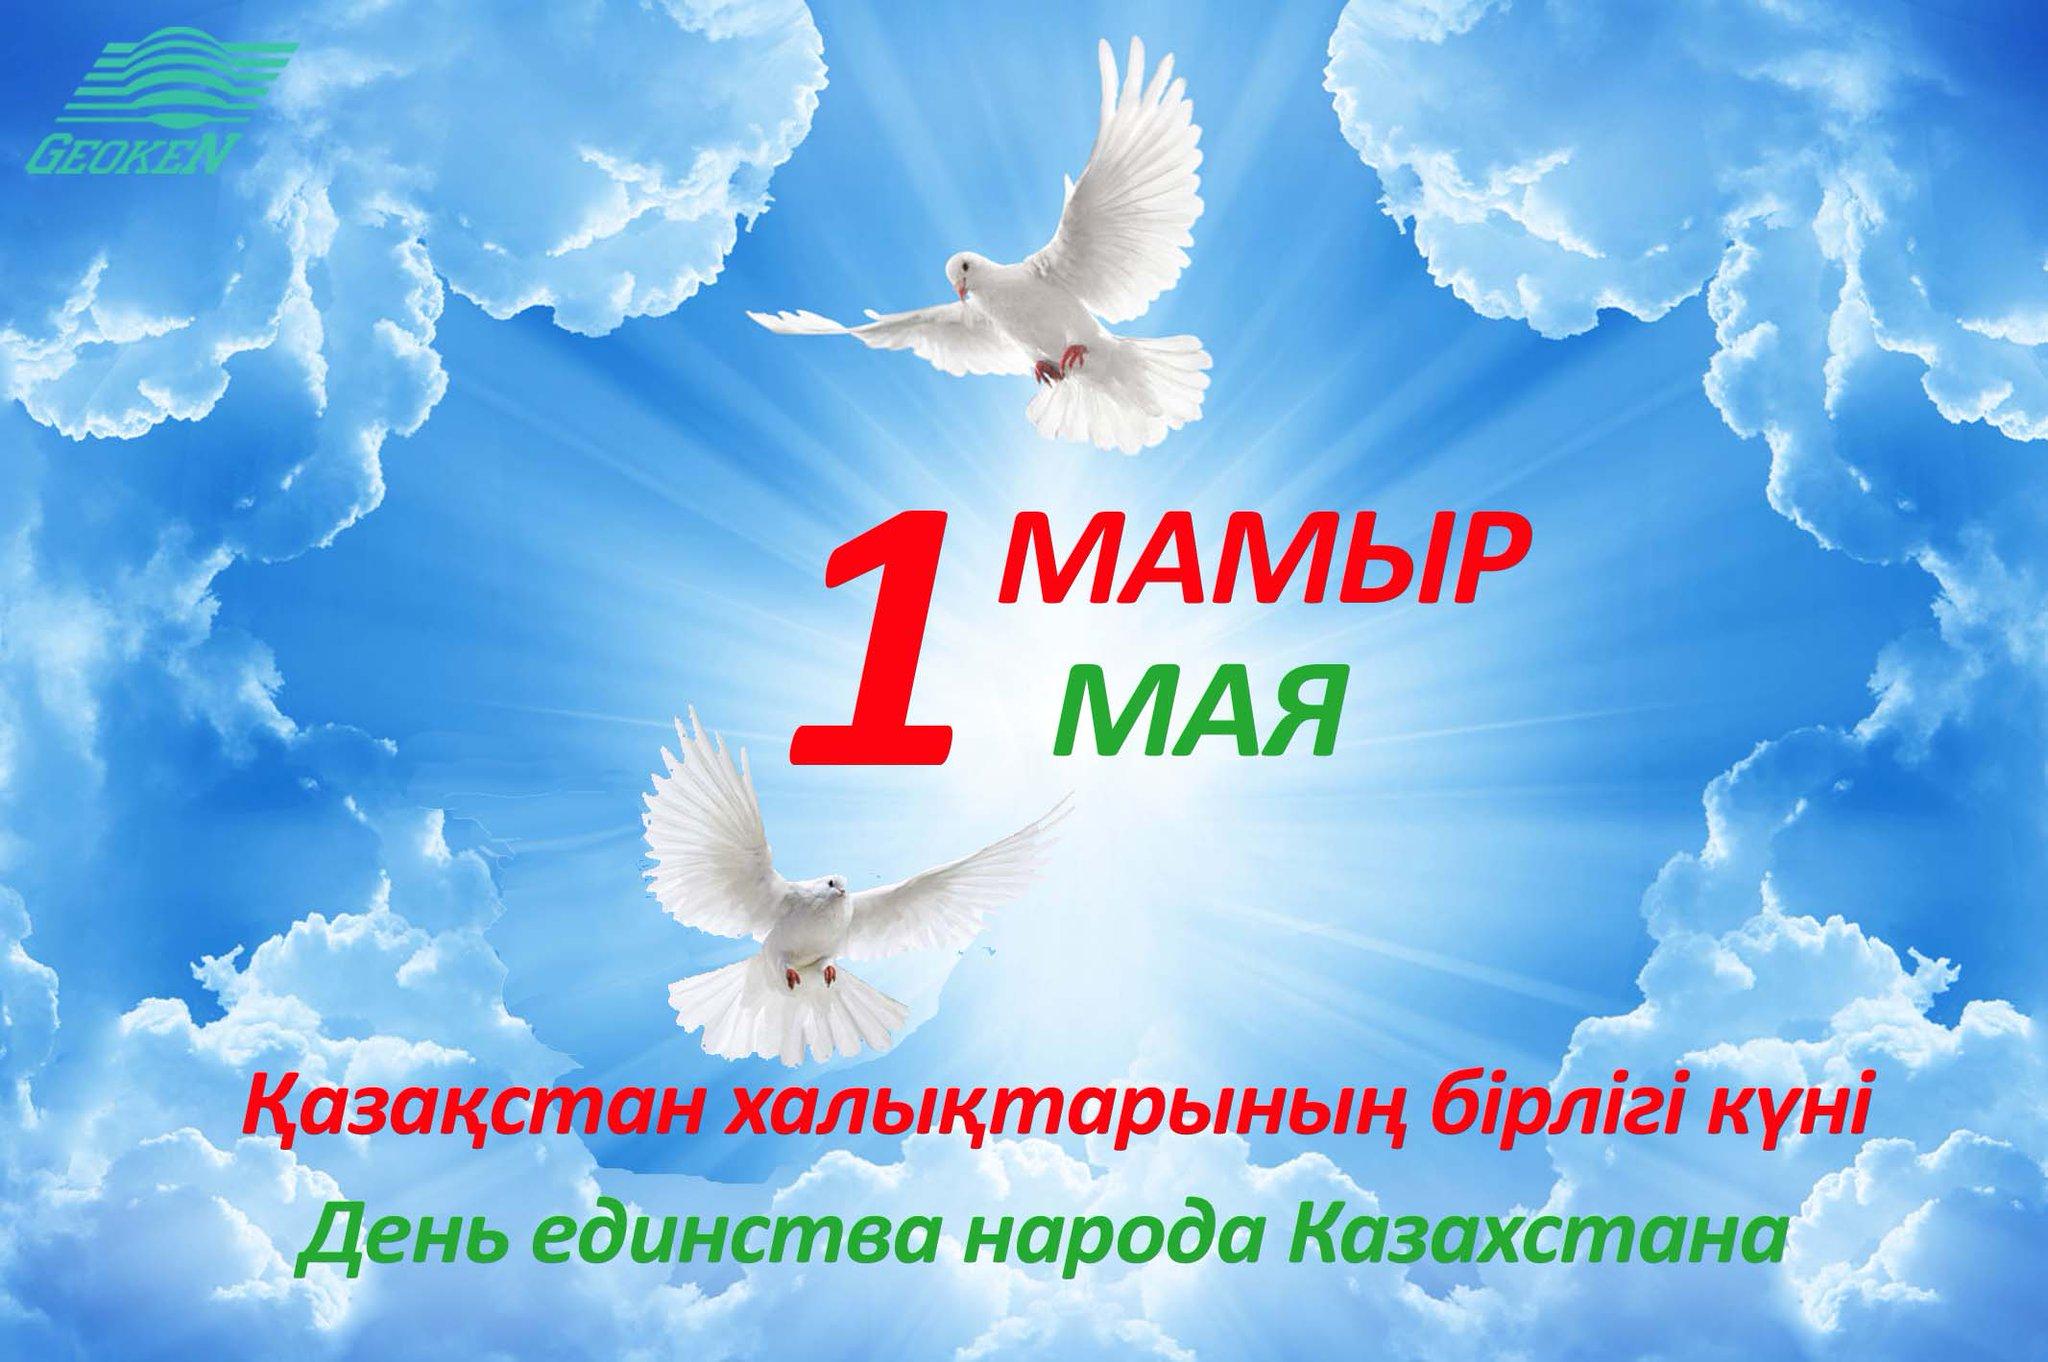 Картинки, открытка с днем единства народов казахстана